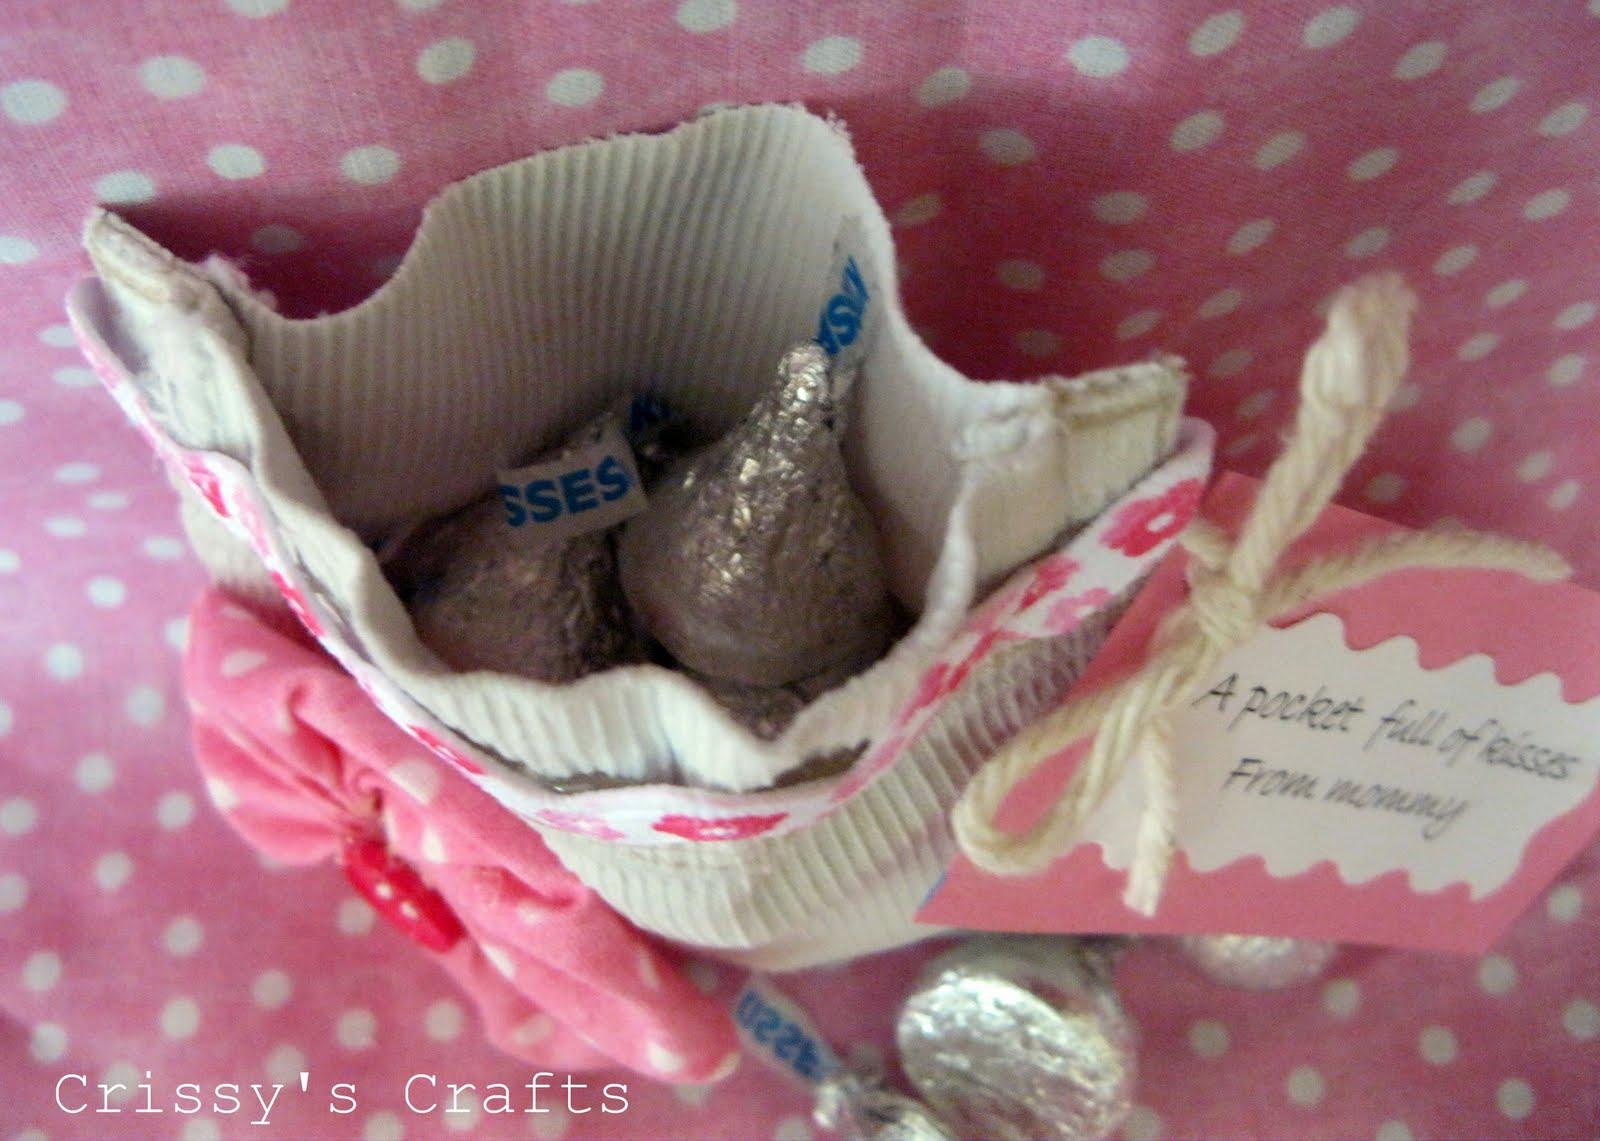 Crissy's Crafts: A Pocket Full of Kisses